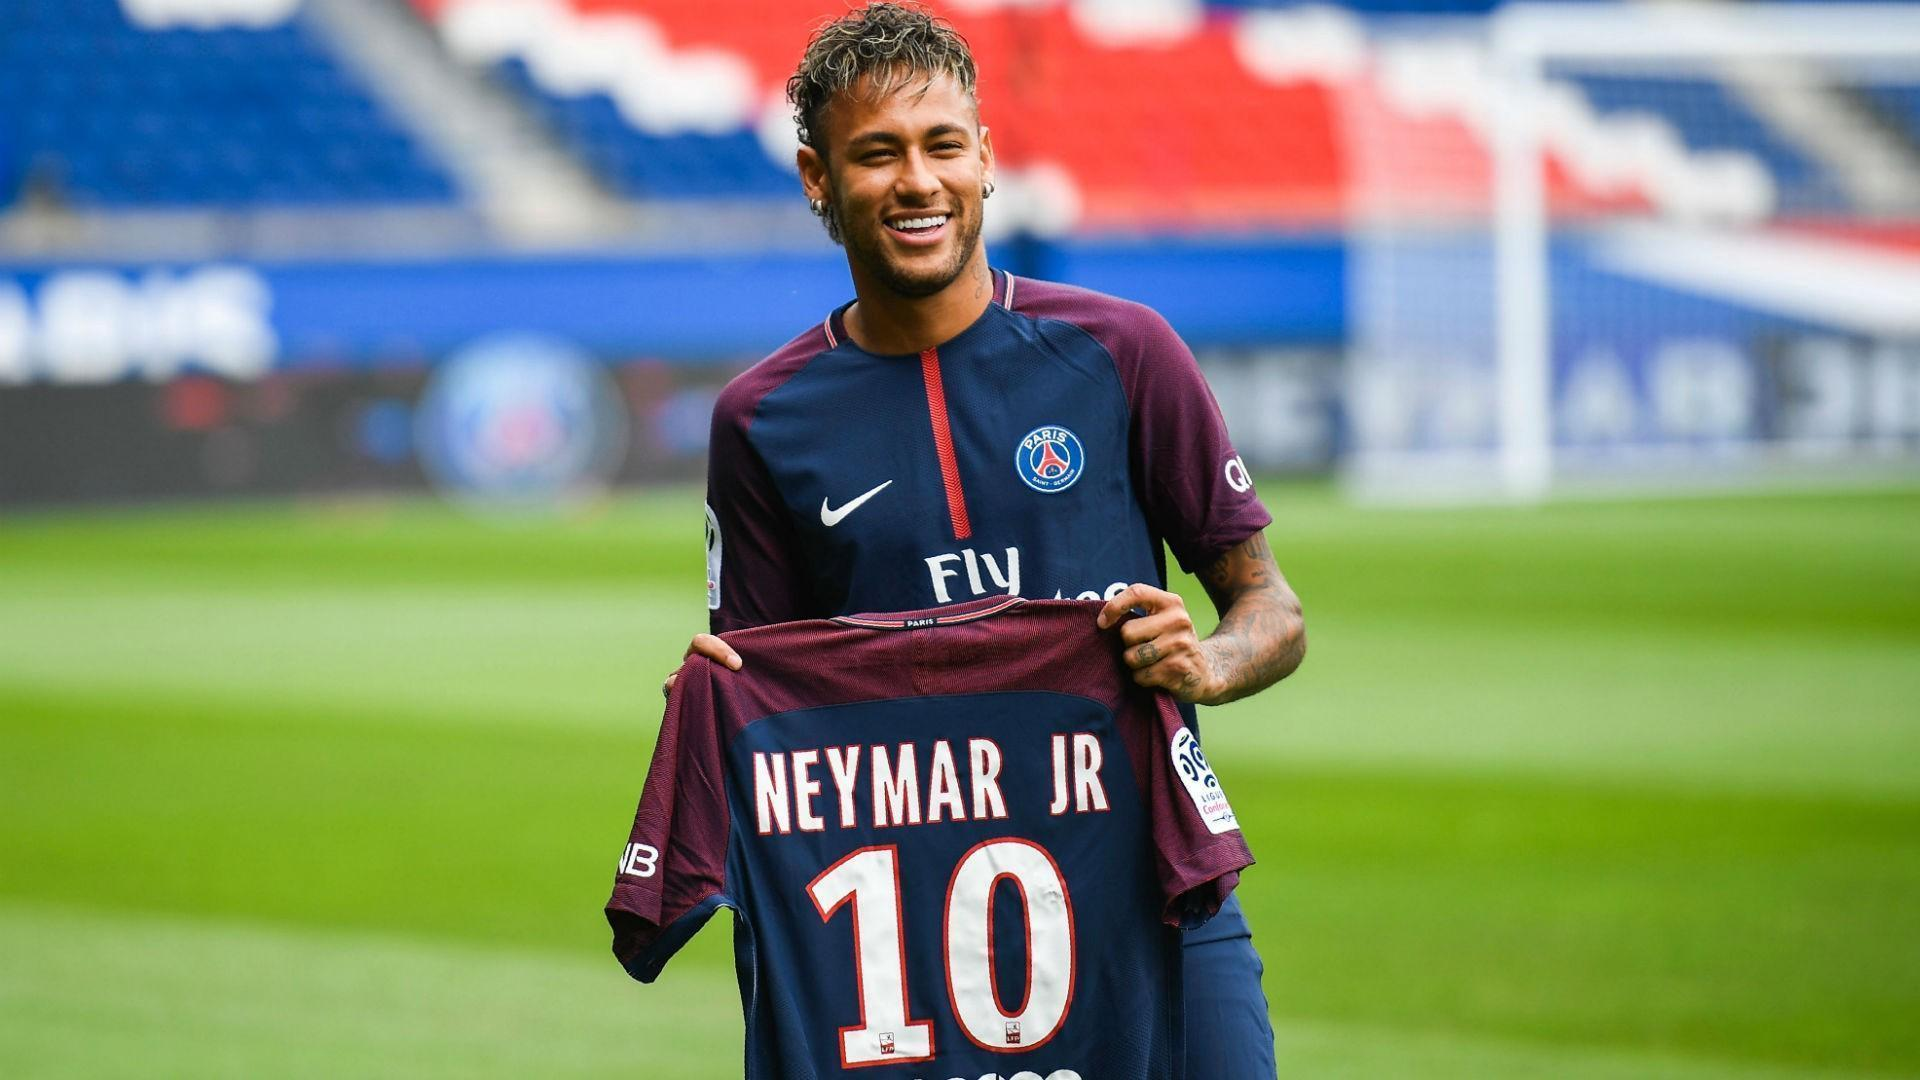 Neymar PSG Wallpapers 1920x1080